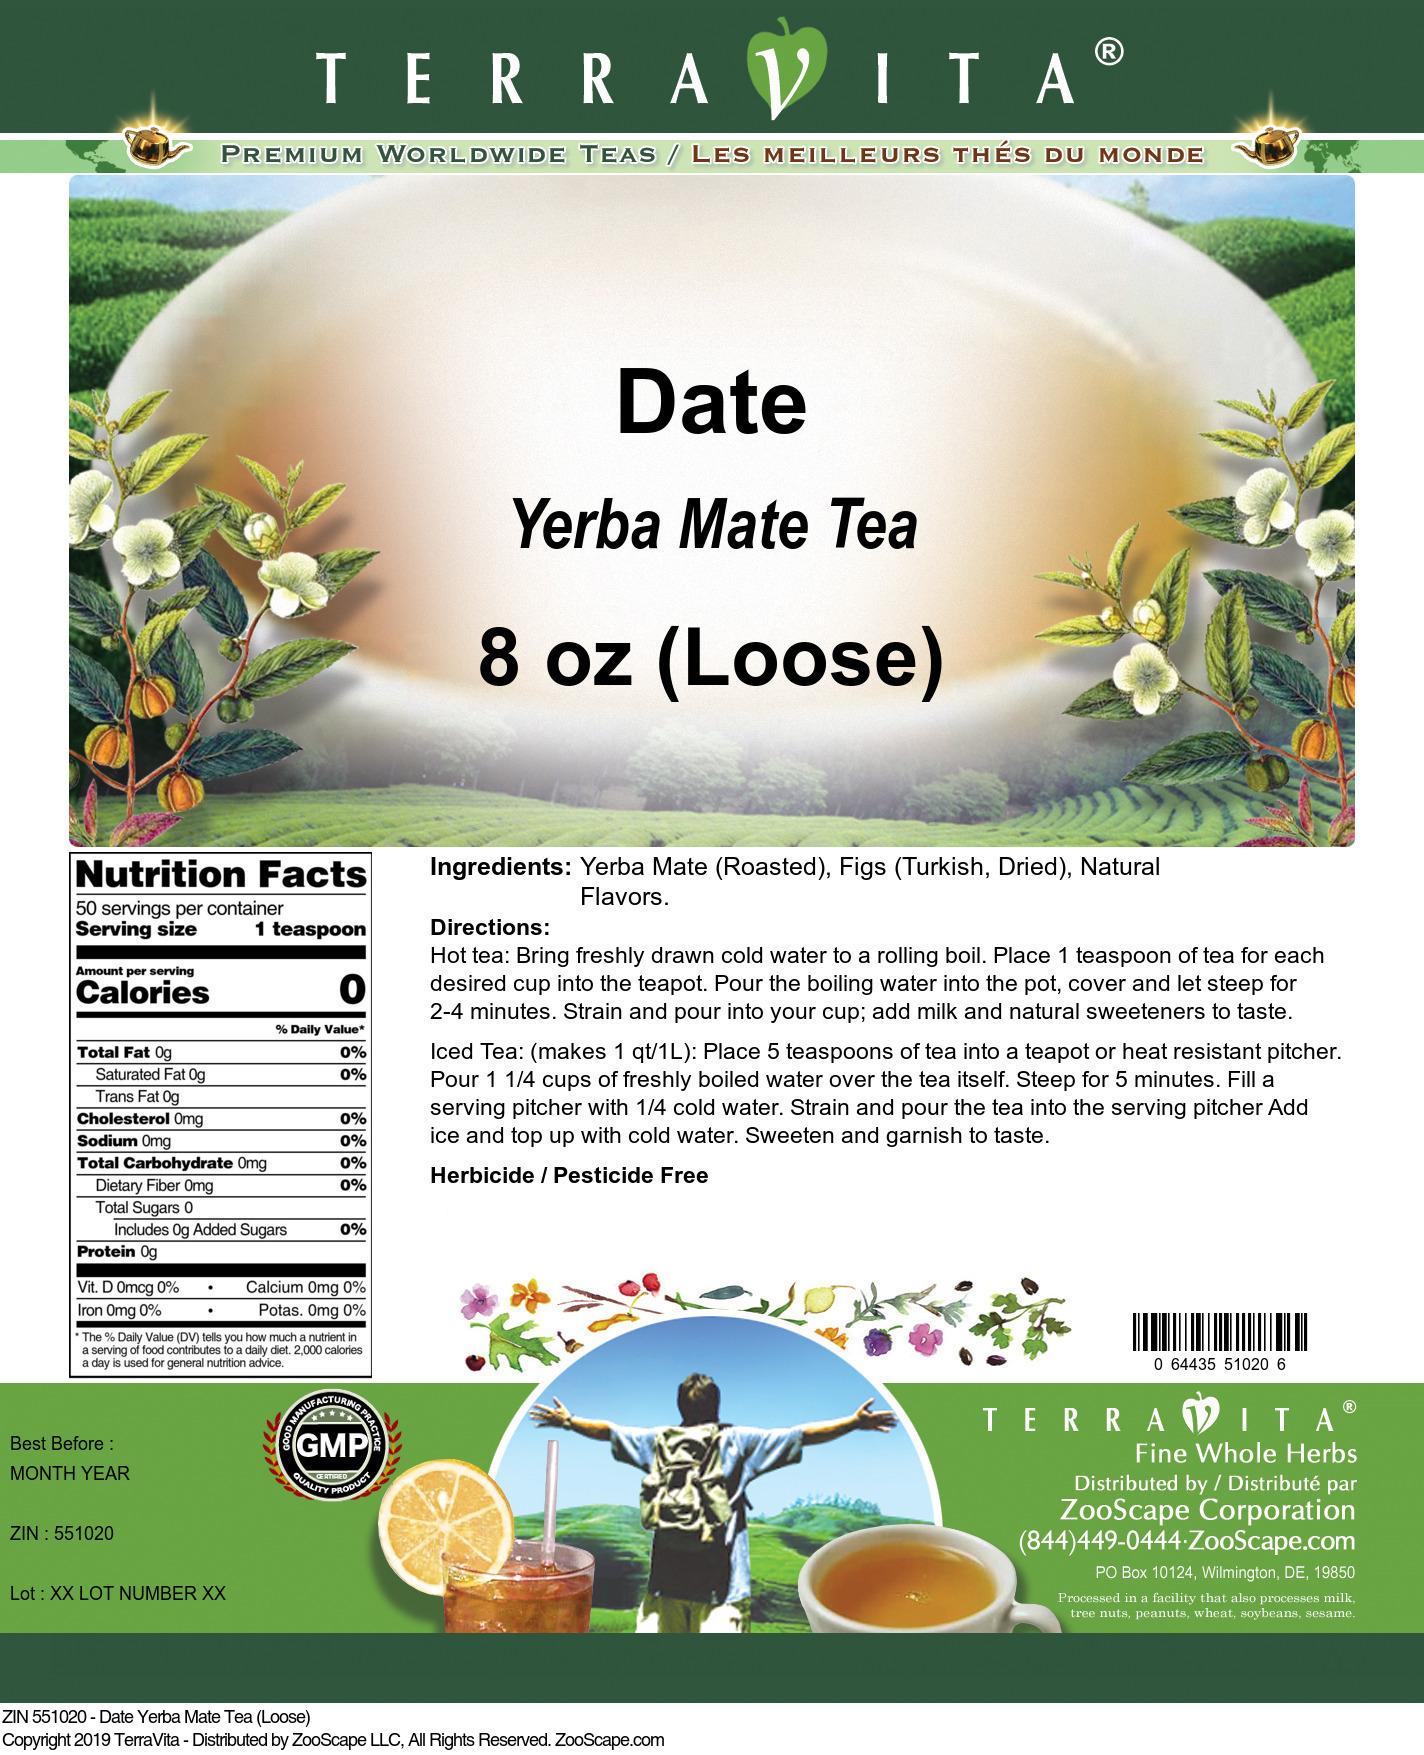 Date Yerba Mate Tea (Loose)